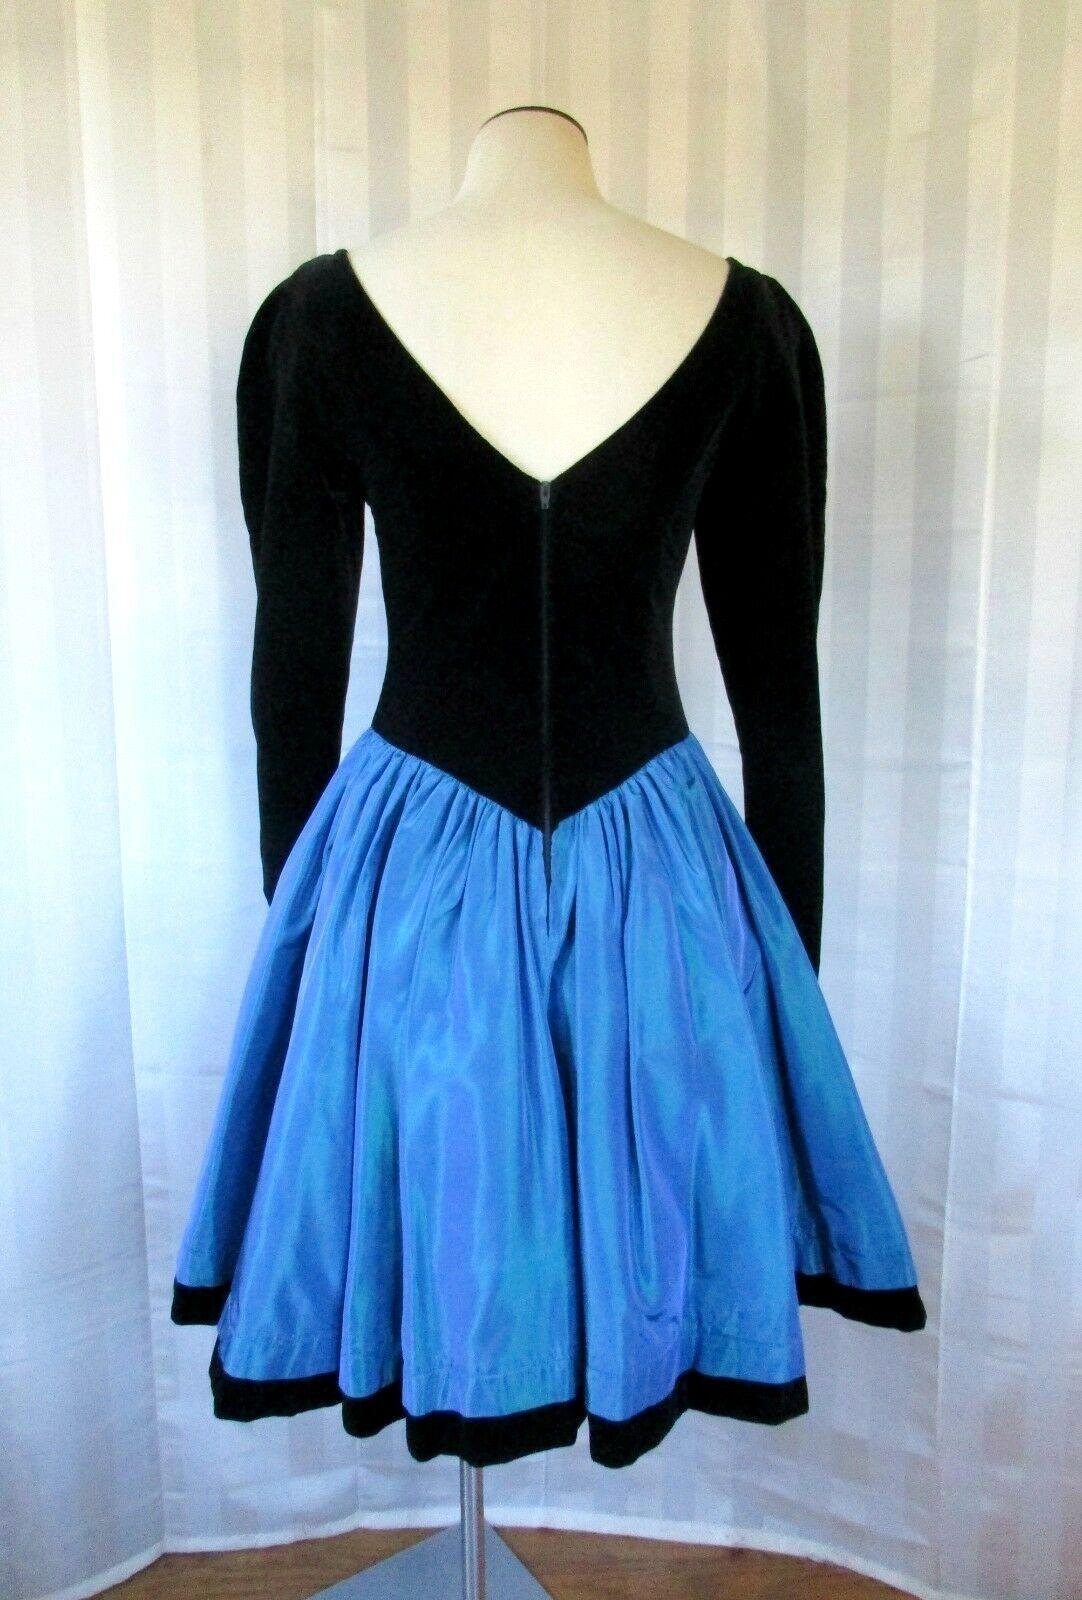 Vintage Laura Ashley Party Dress 1980s 1990s Blac… - image 3